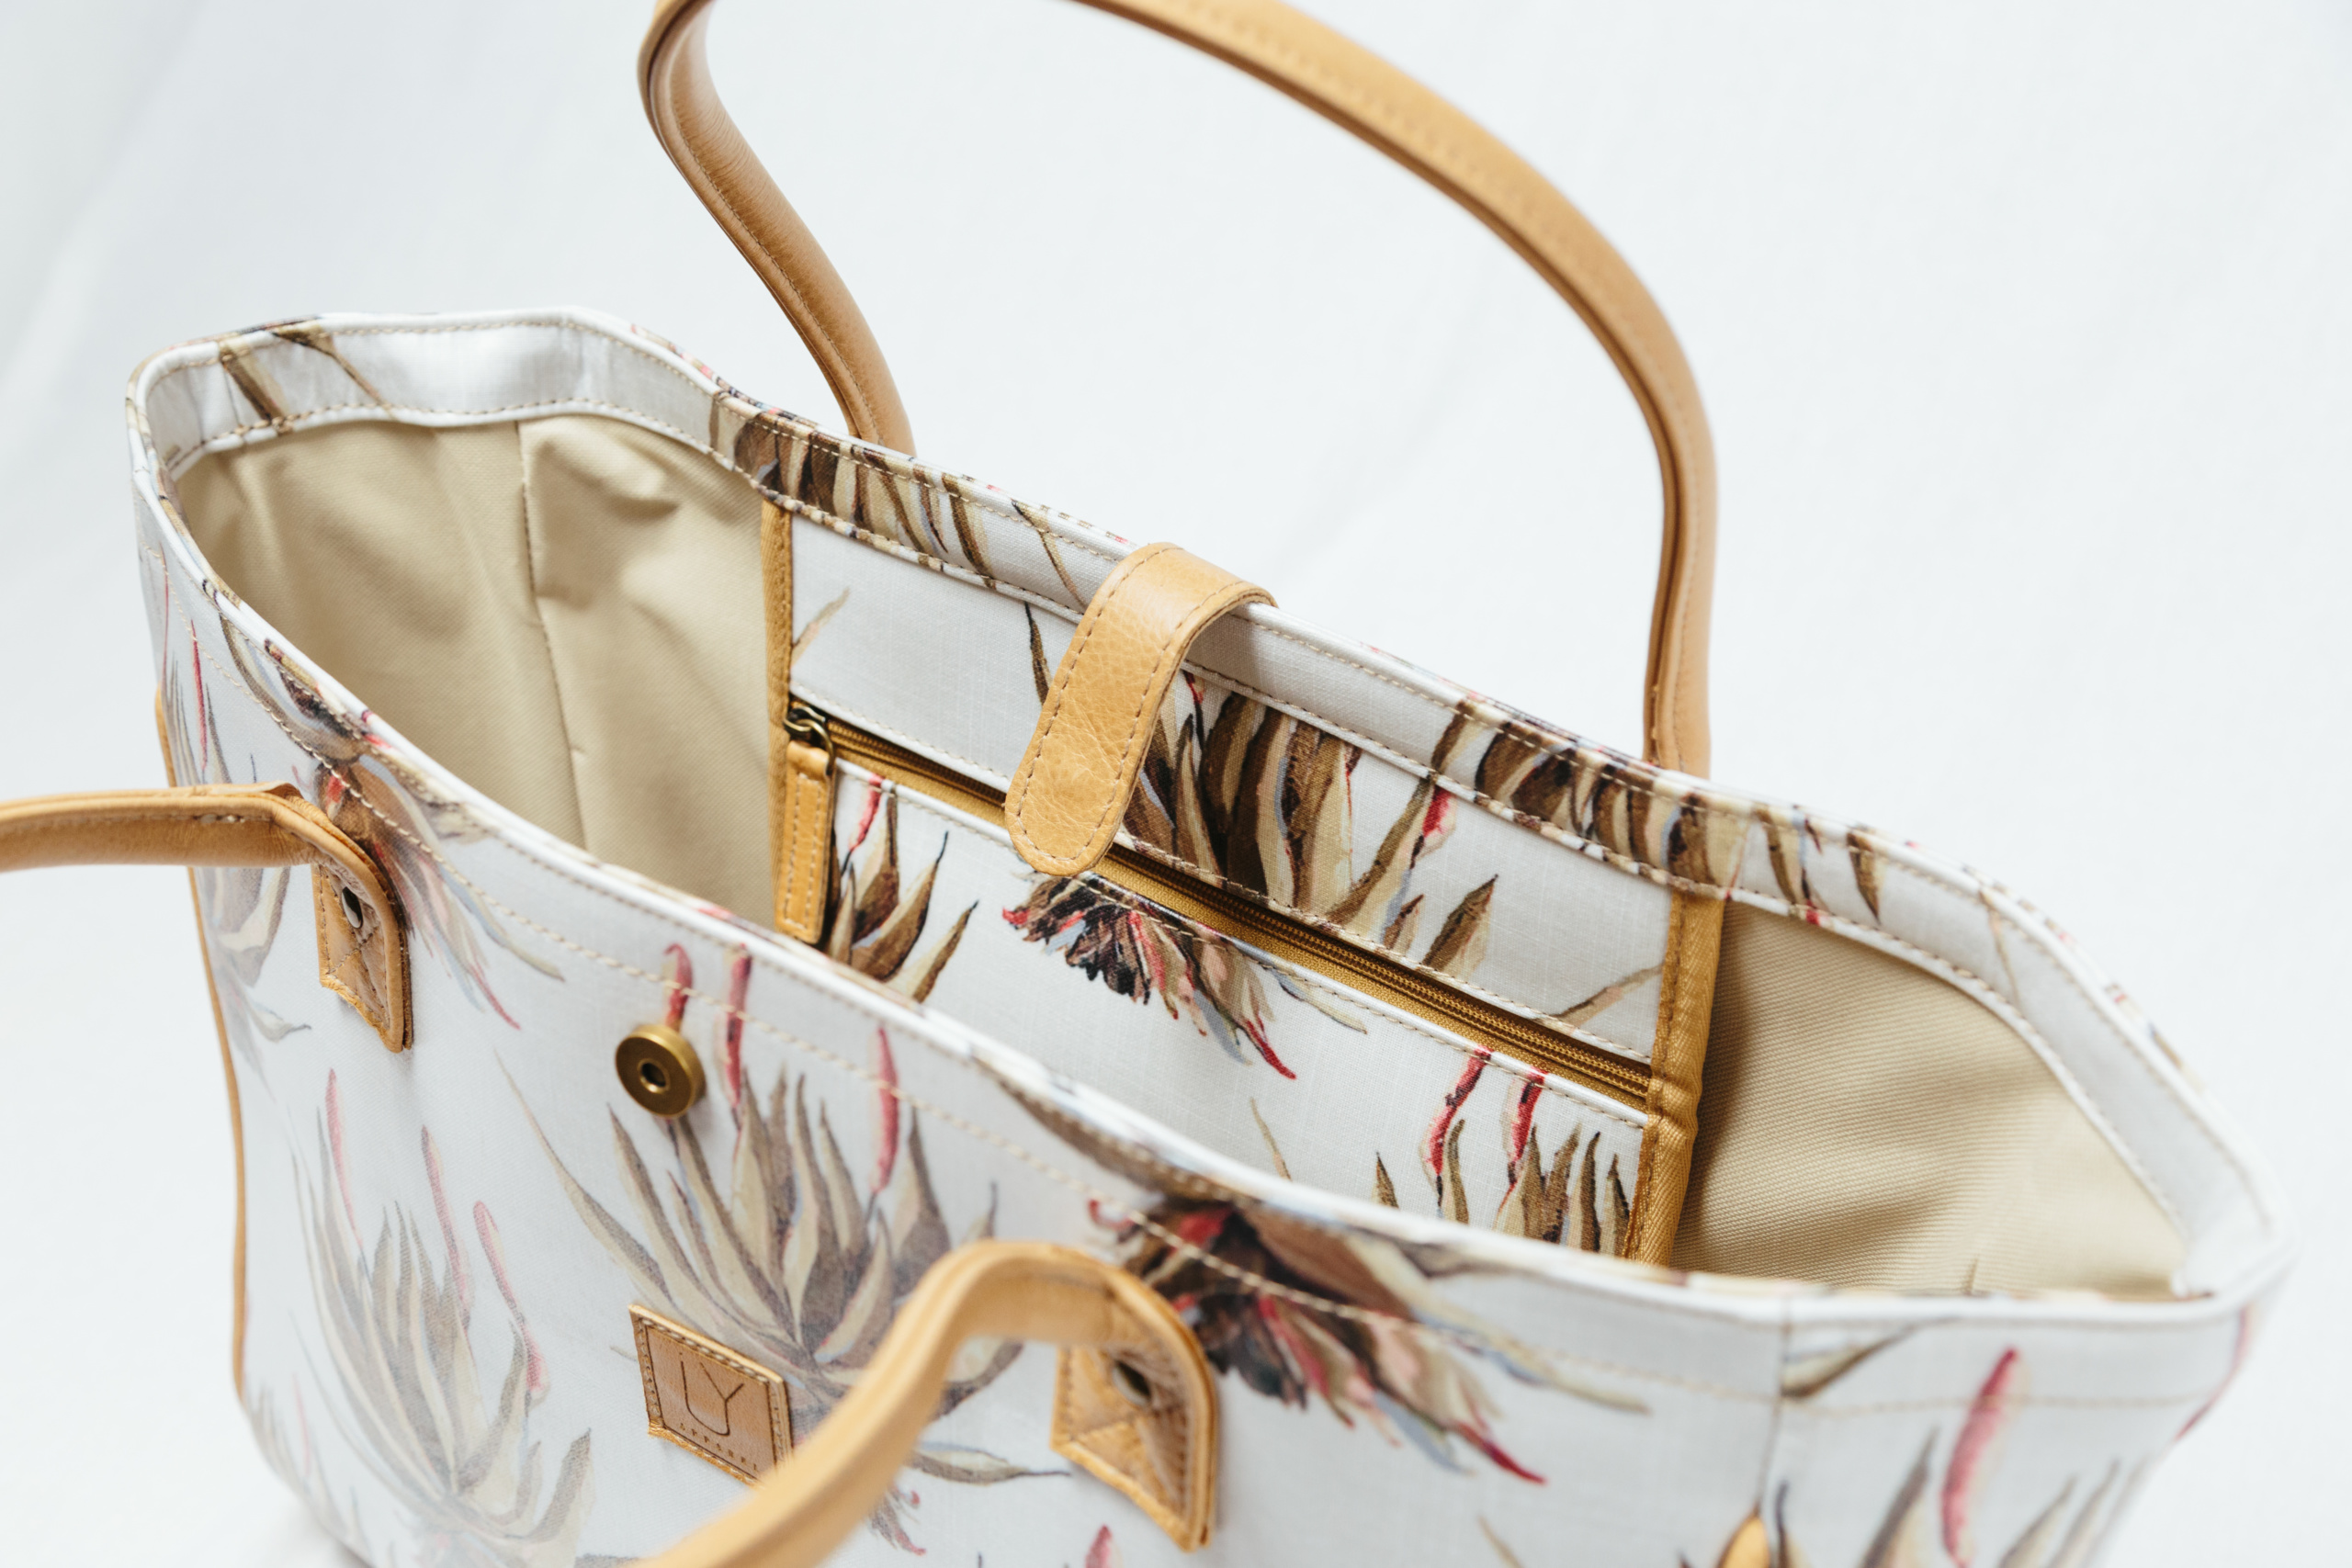 beach-bag-IY-Apparel-inside-view